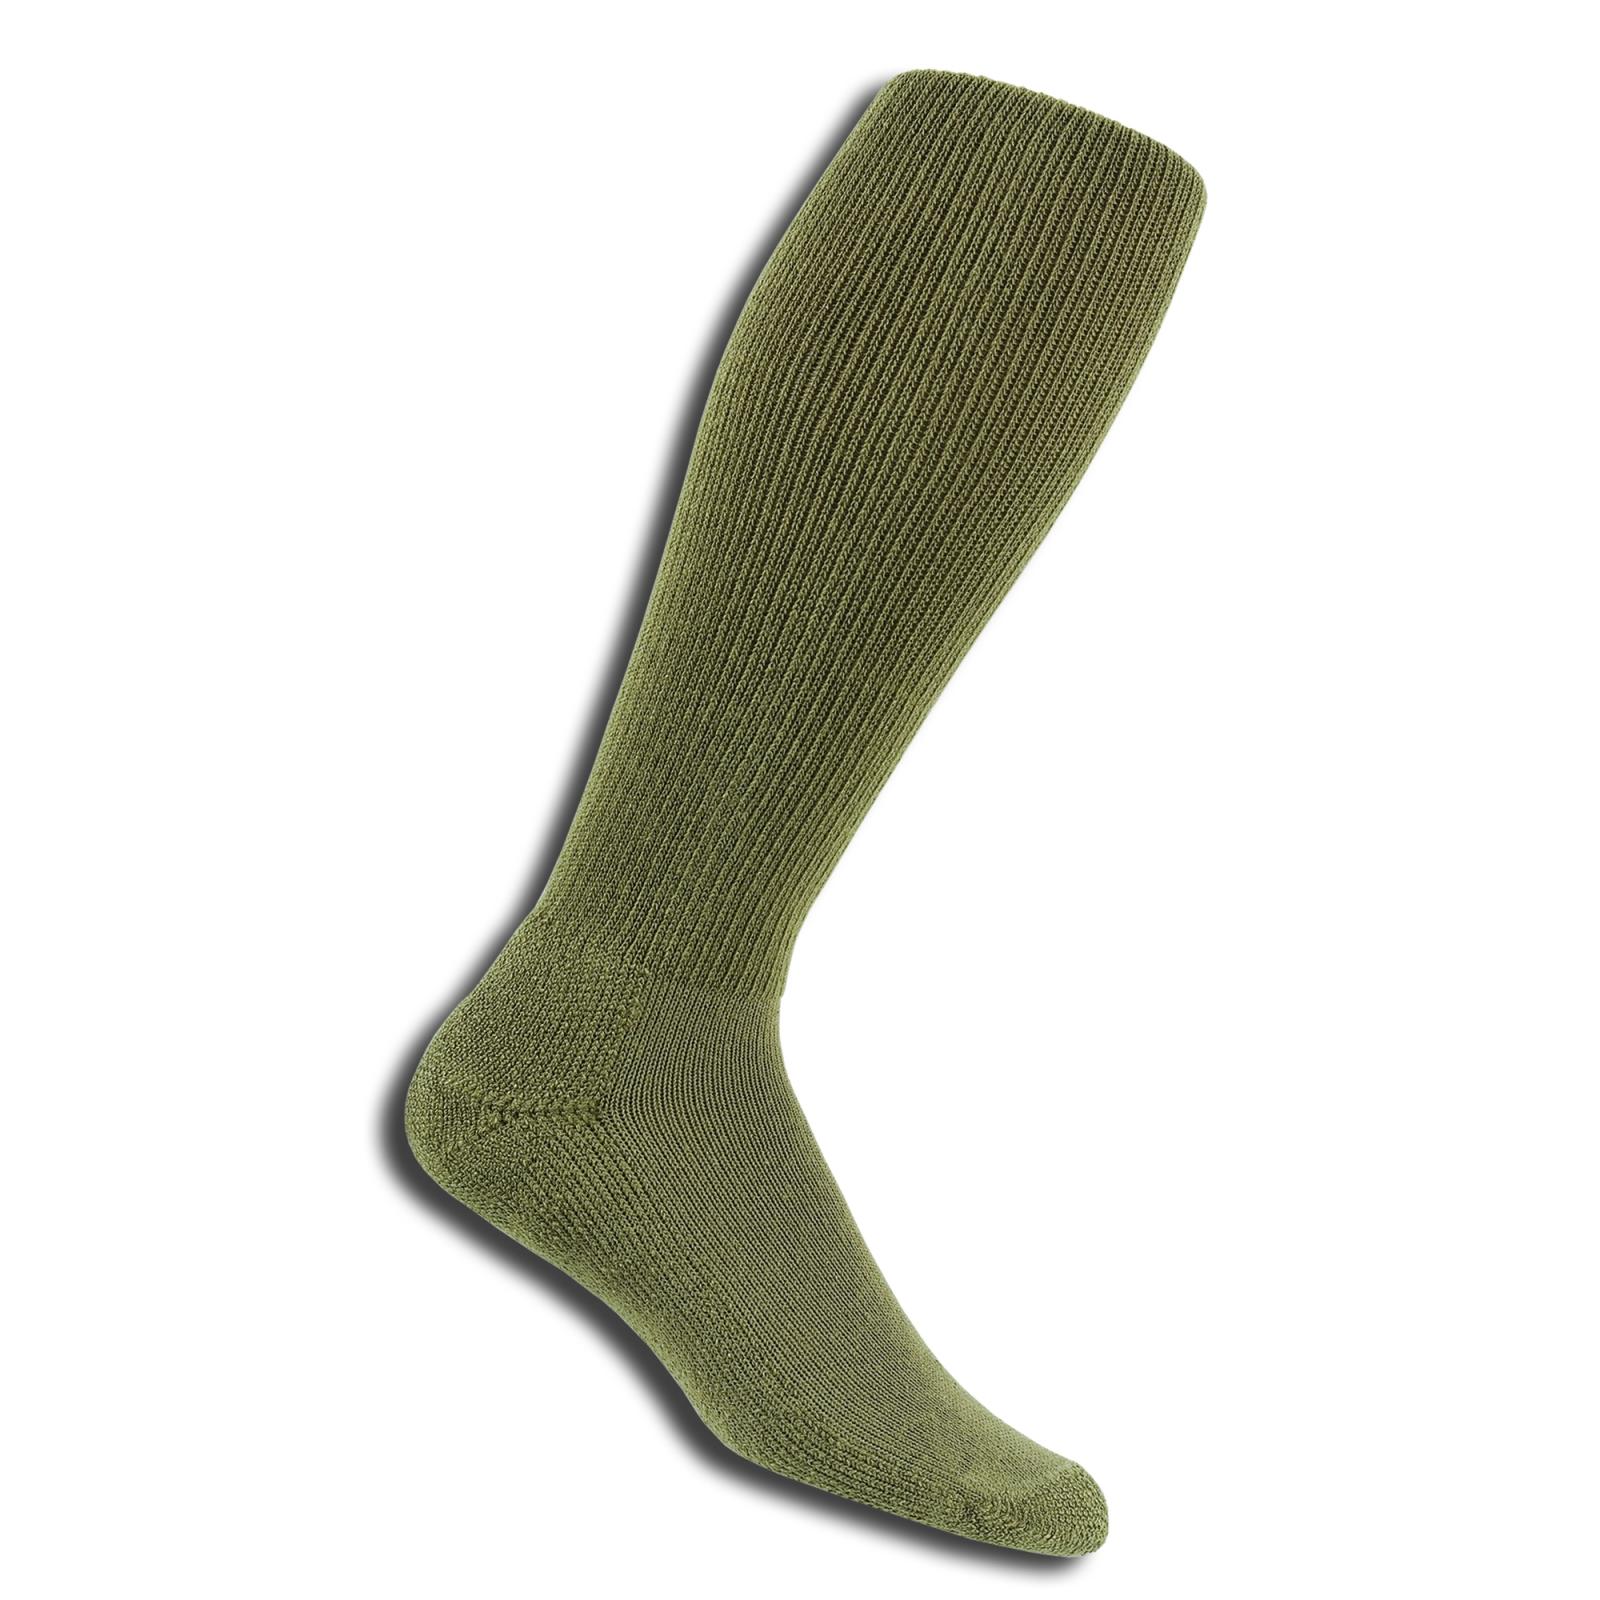 MS Anti-Fatigue Socks Over-Calf